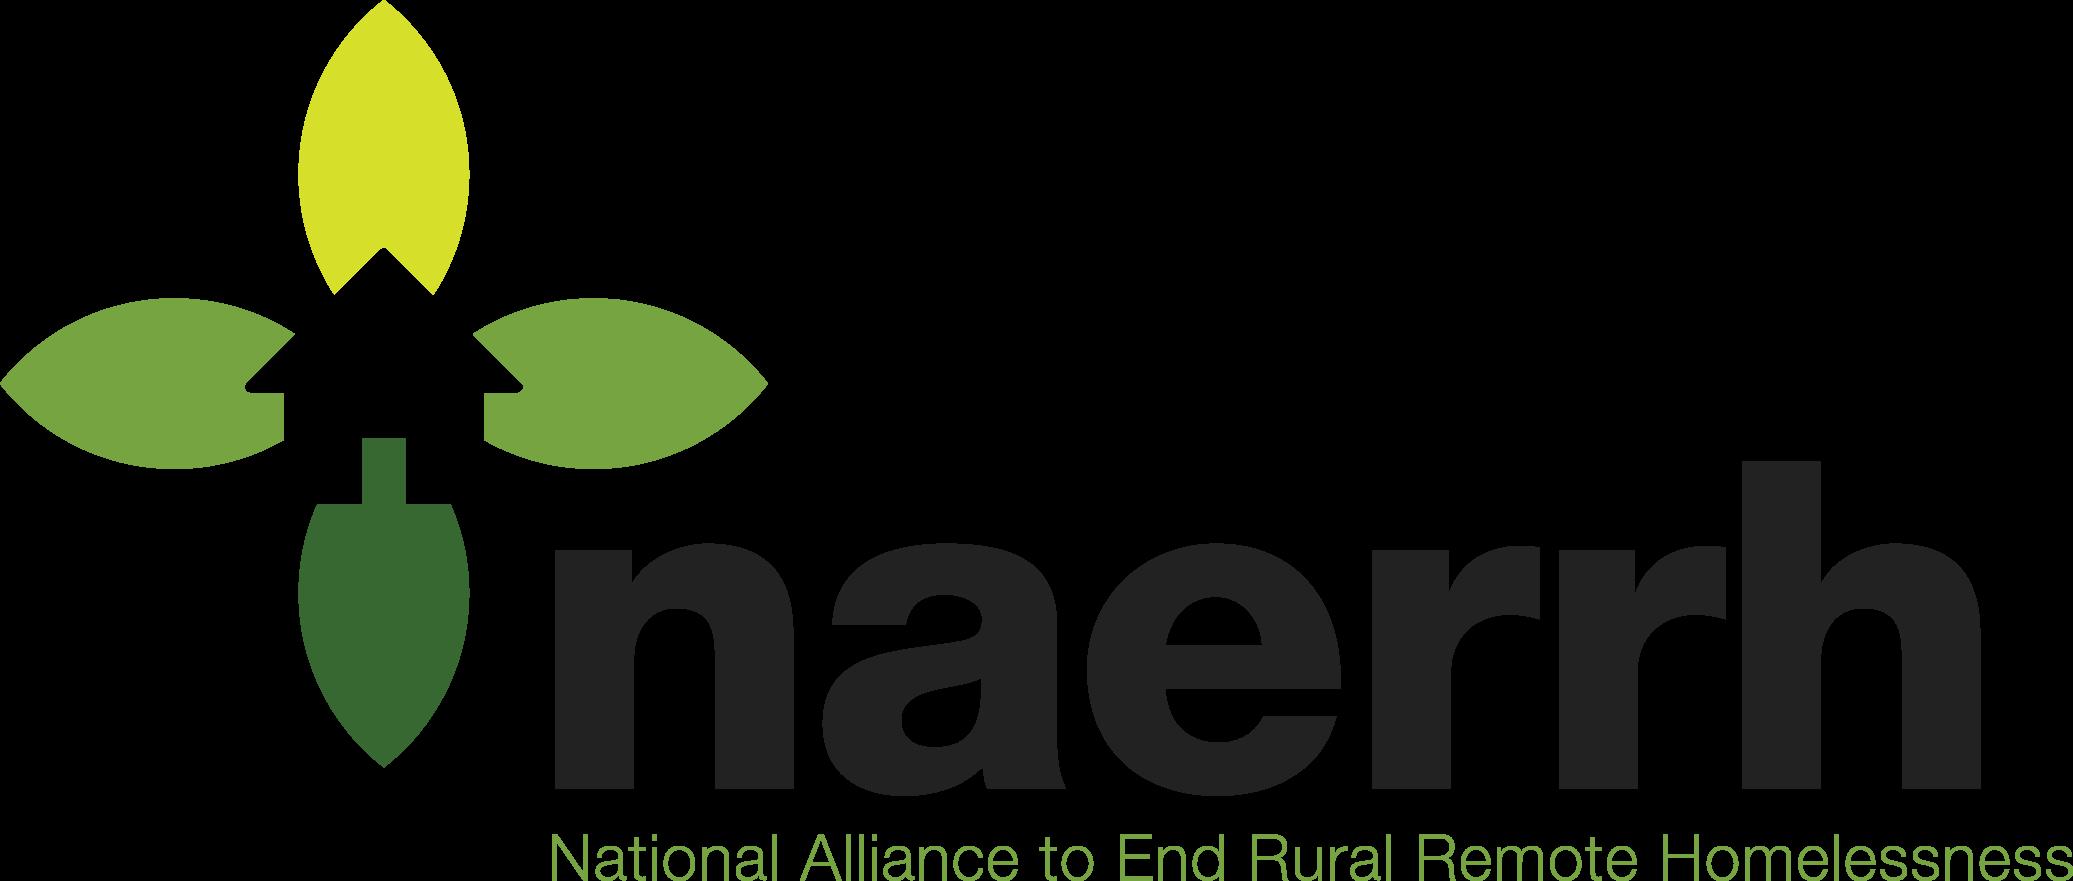 NAERRH_logo copy